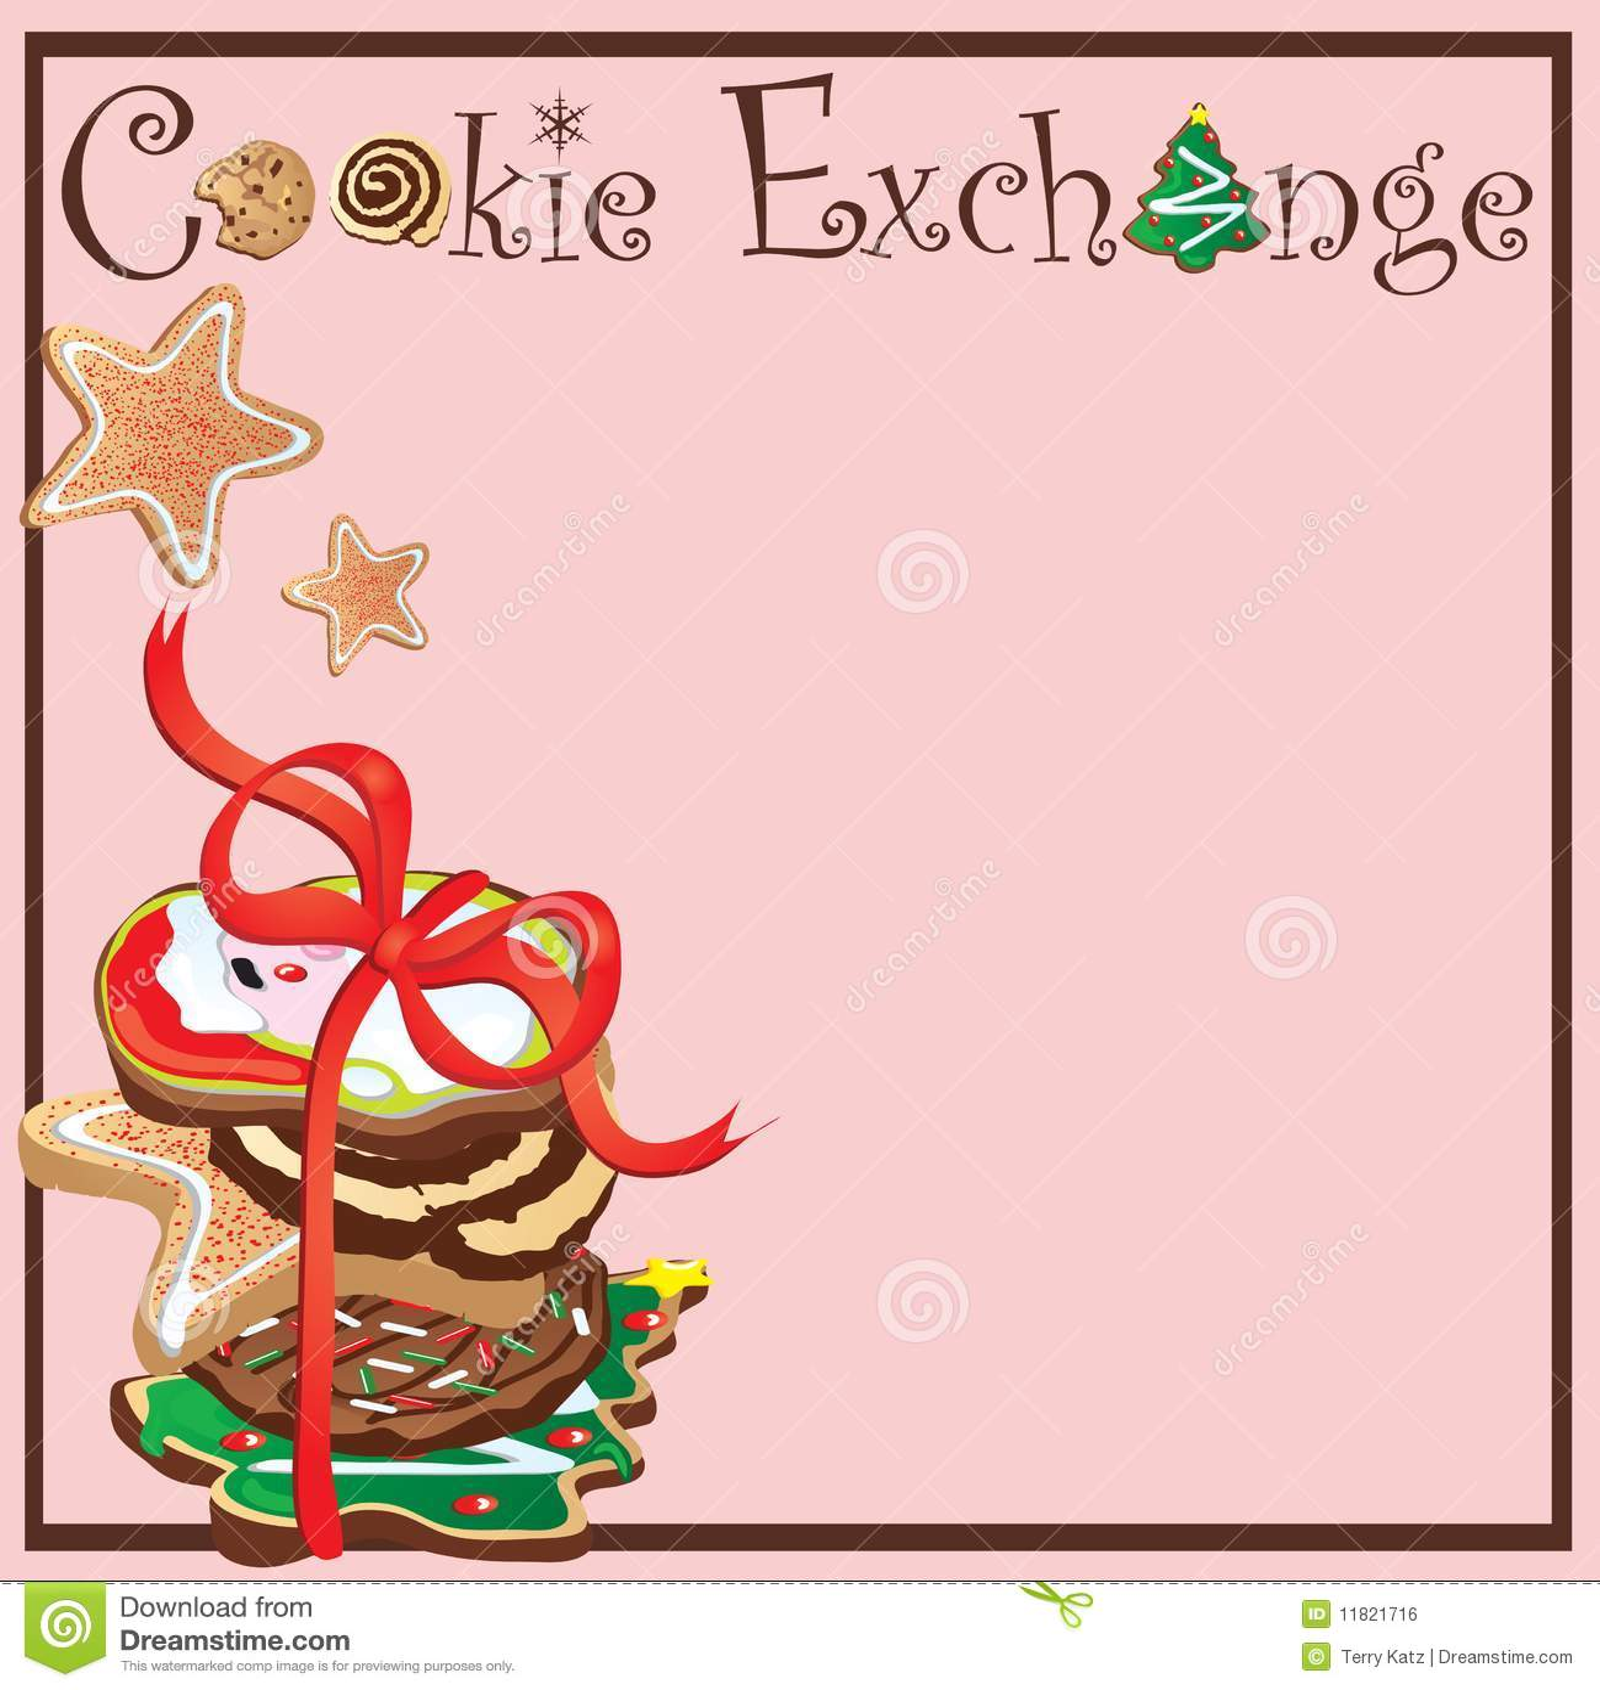 free christmas cookie borders clip art - photo #30